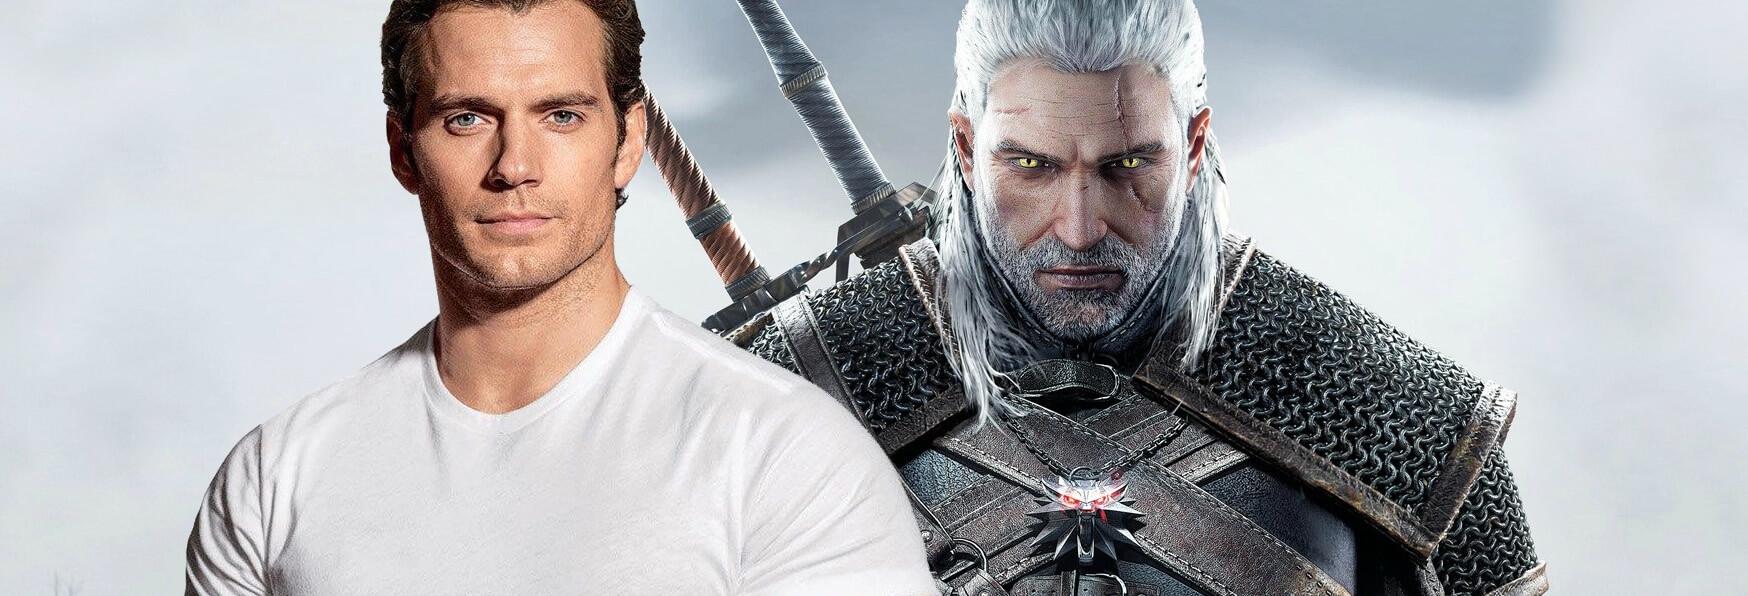 The Witcher: Geralt sarà interpretato da Henry Cavill